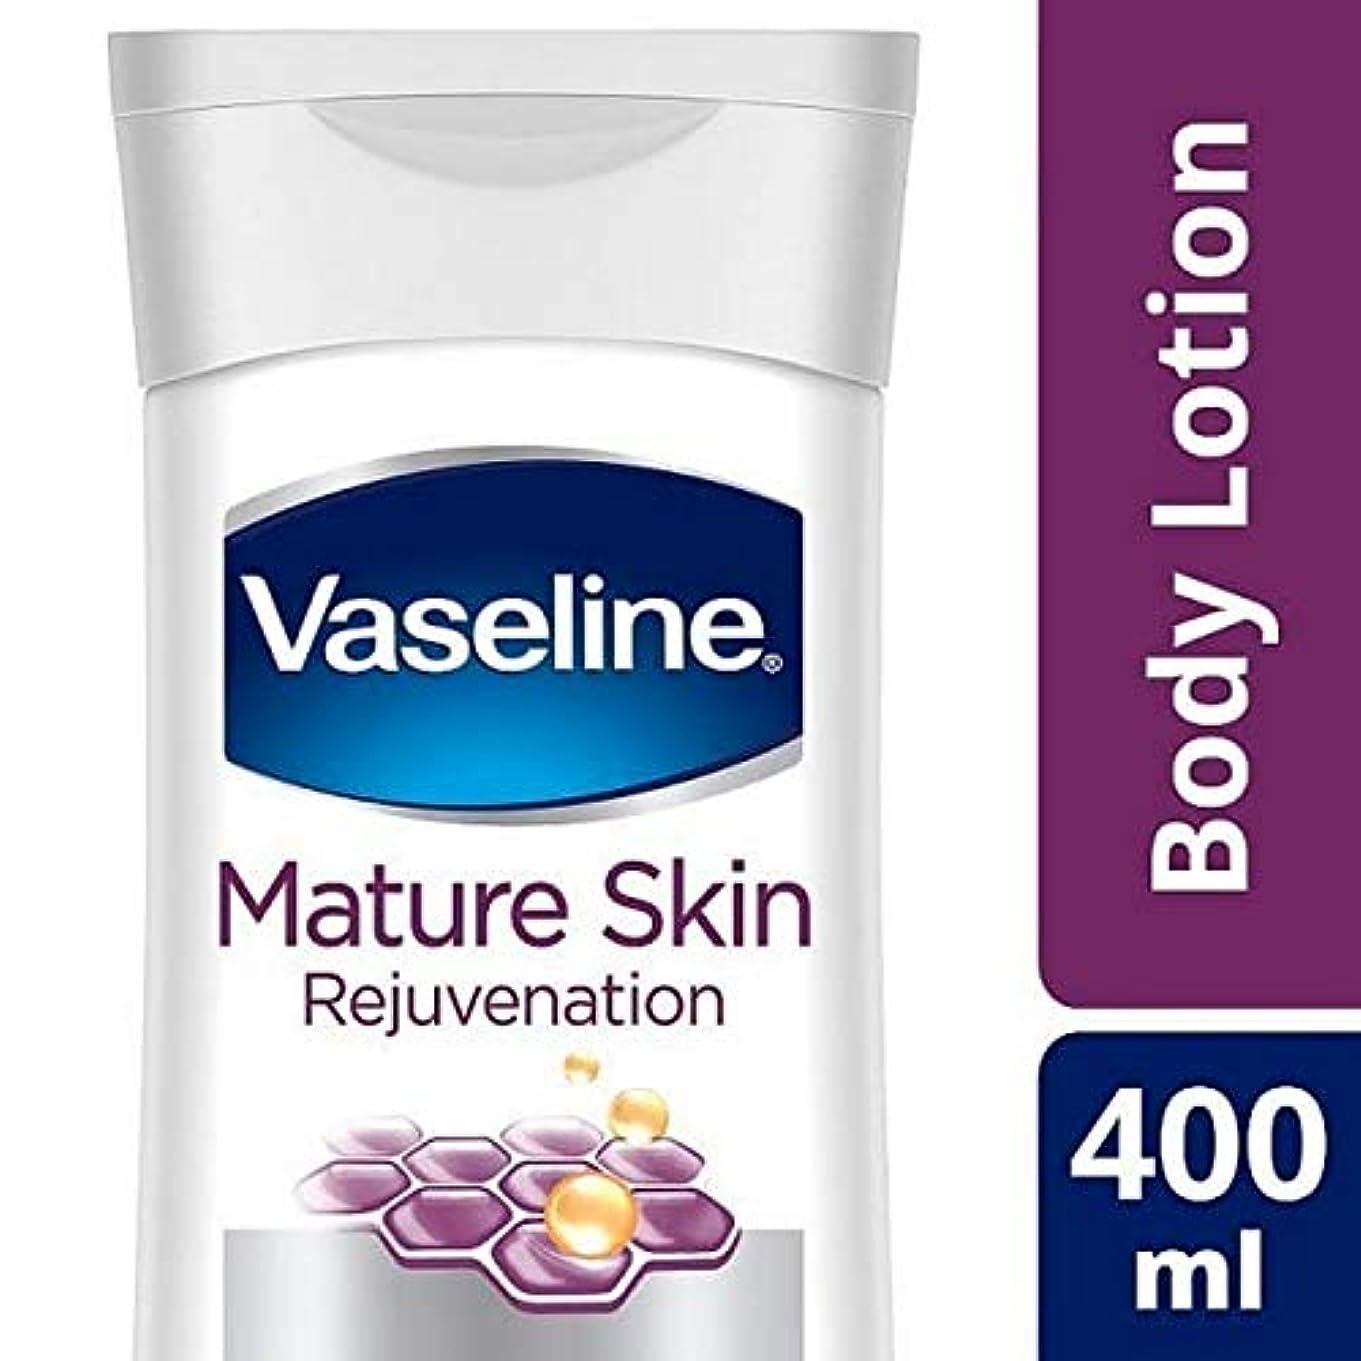 [Vaseline ] 成熟した肌のための400ミリリットルワセリン集中治療ボディローション - Vaseline Intensive Care Body Lotion for Mature Skin 400ml [並行輸入品]